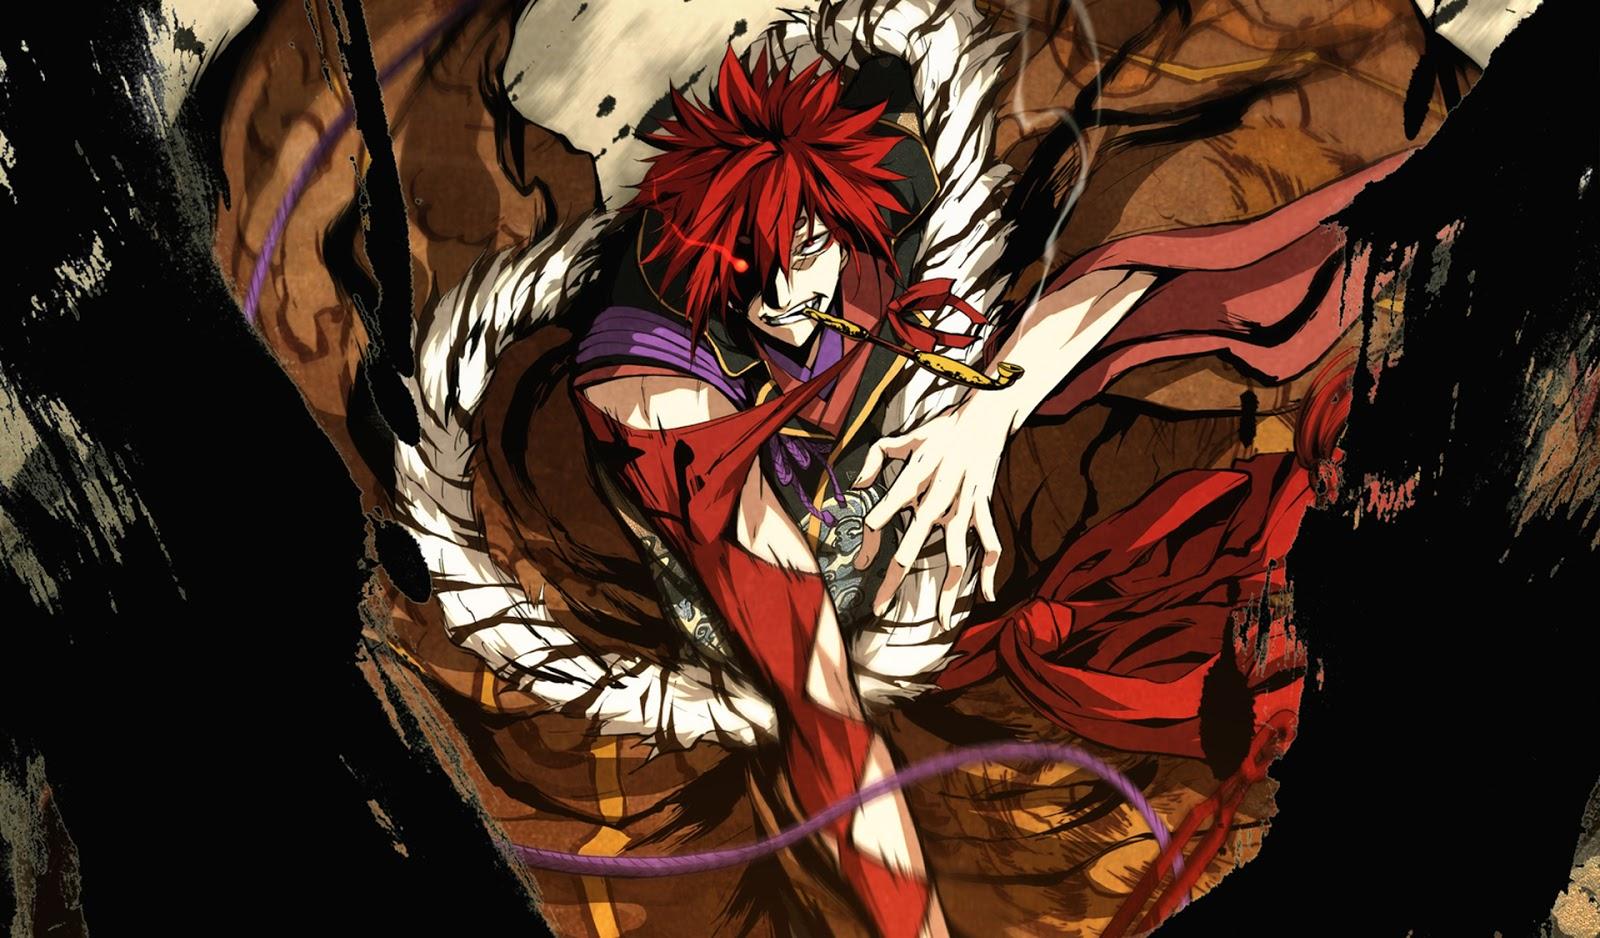 Oργανωσεις / Εταιριες κλπ Habaki_sakagami_kajiri_kamu_kagura_pipe_red_Anime_Male_HD_Wallpaper_Image_Picture_Photo_backgrounds